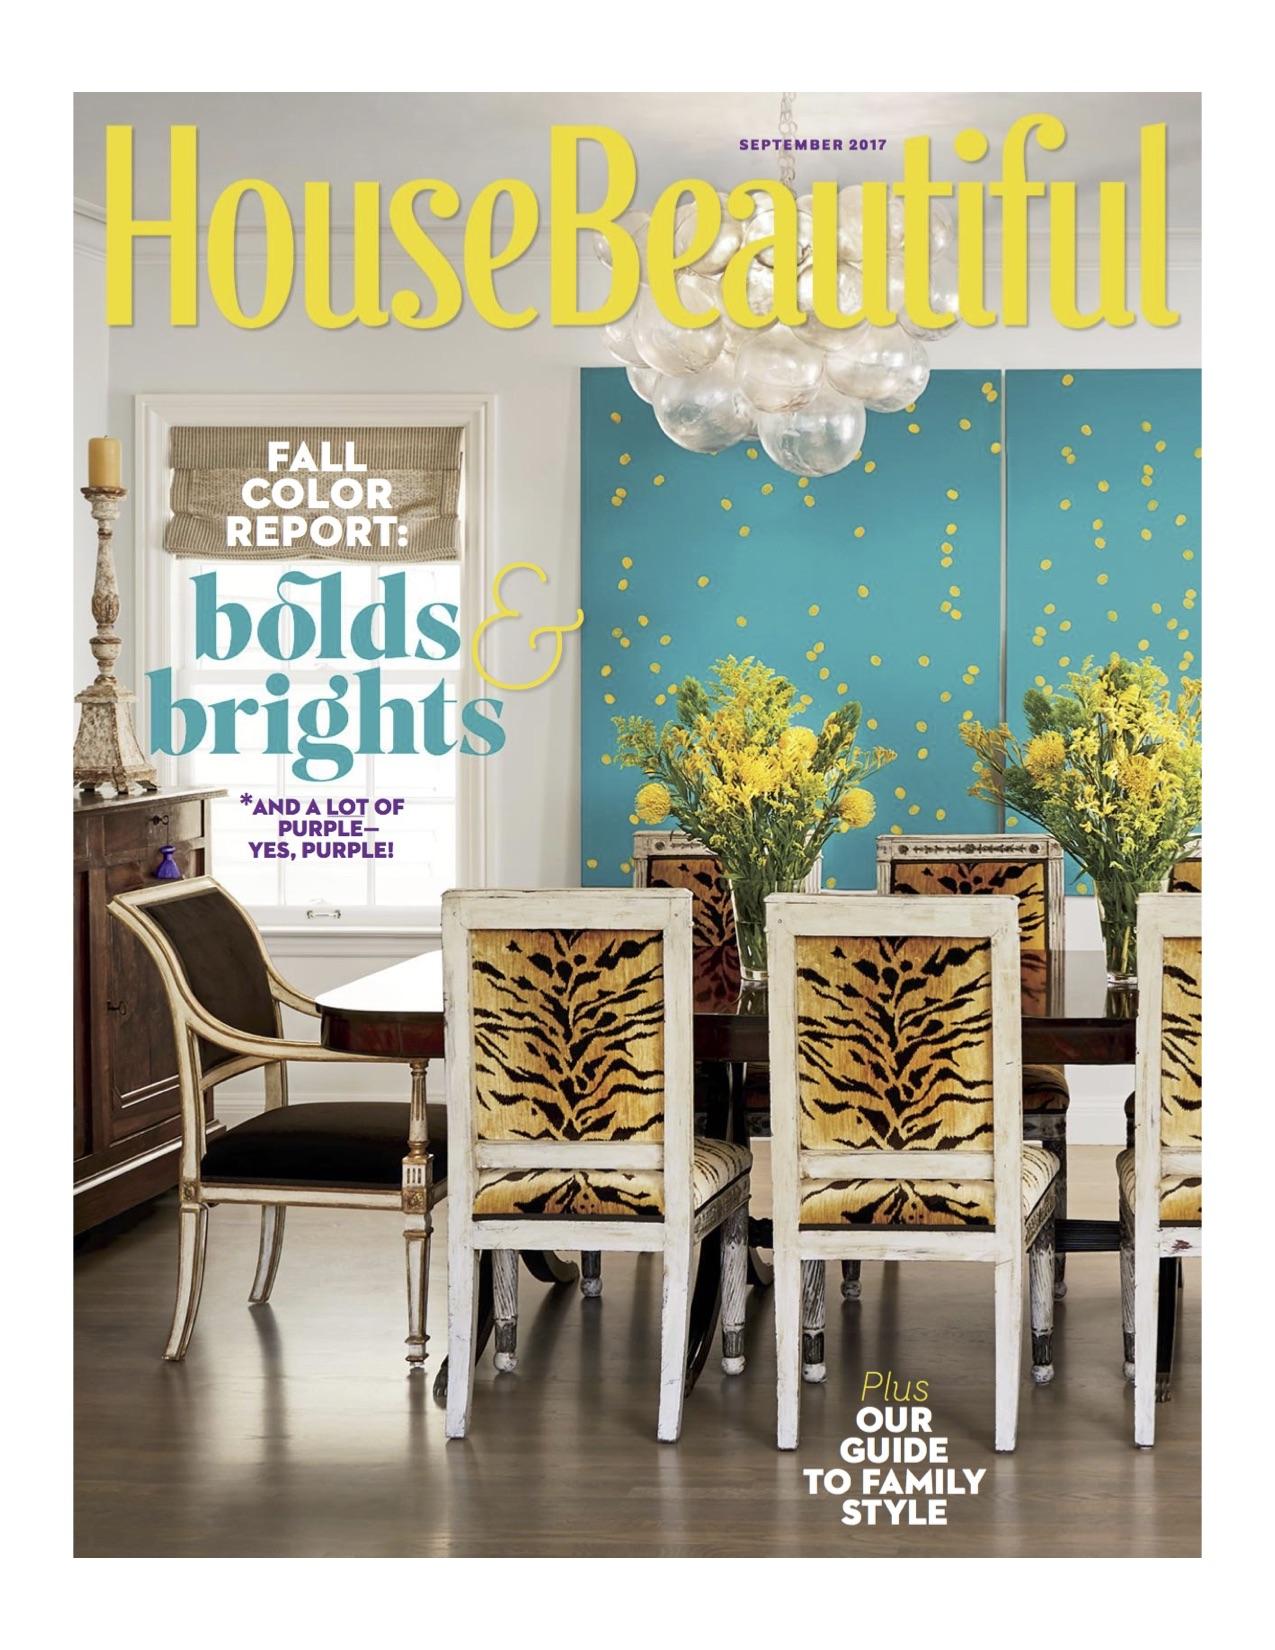 House Beautiful Magazine September 2017 issue